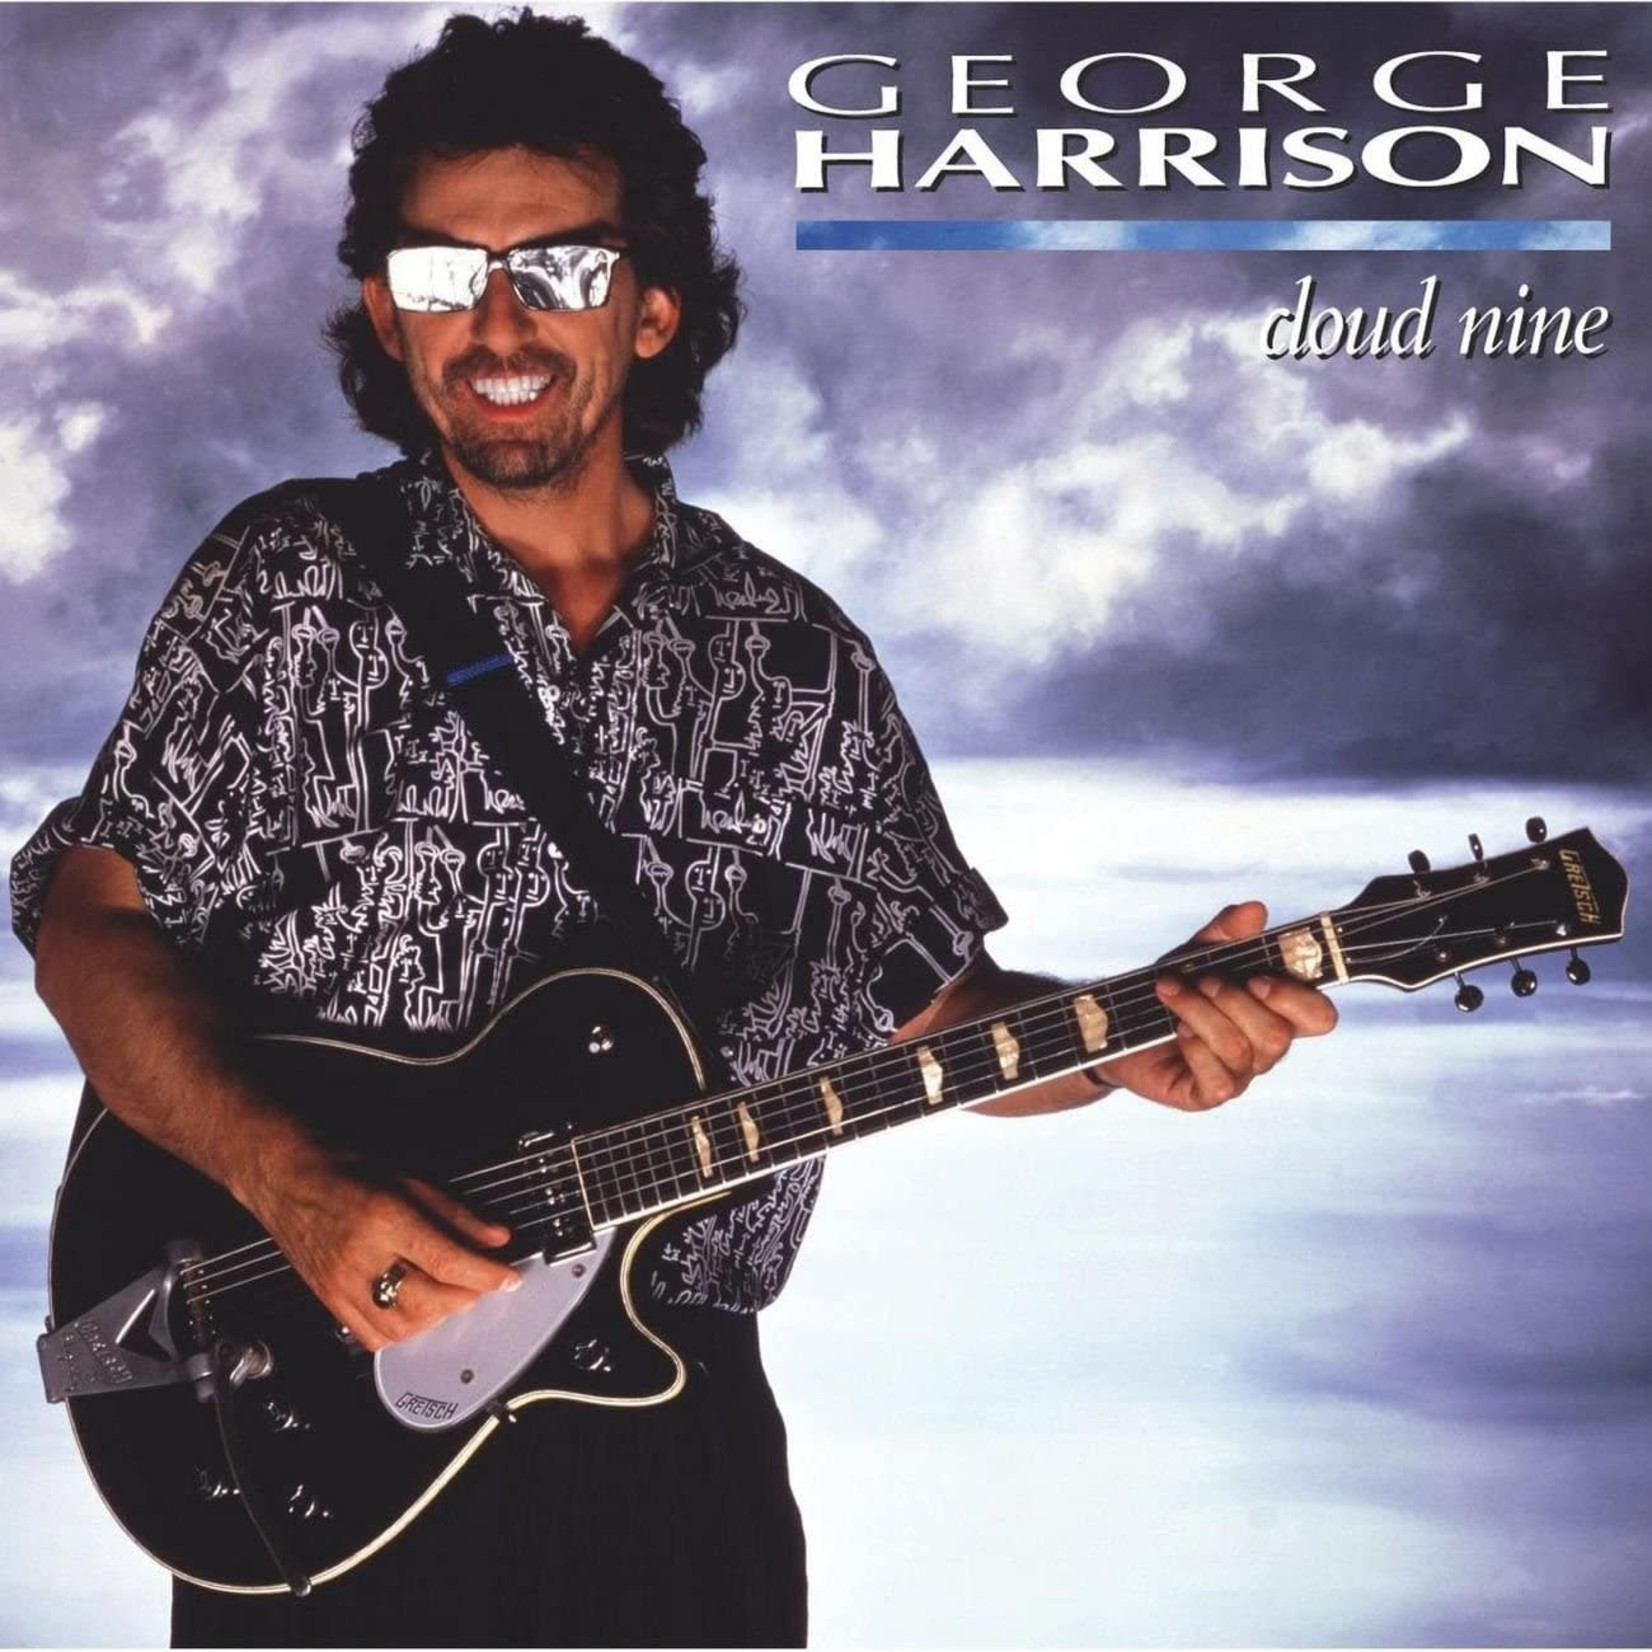 [Vintage] Harrison, George (Beatles): Cloud Nine